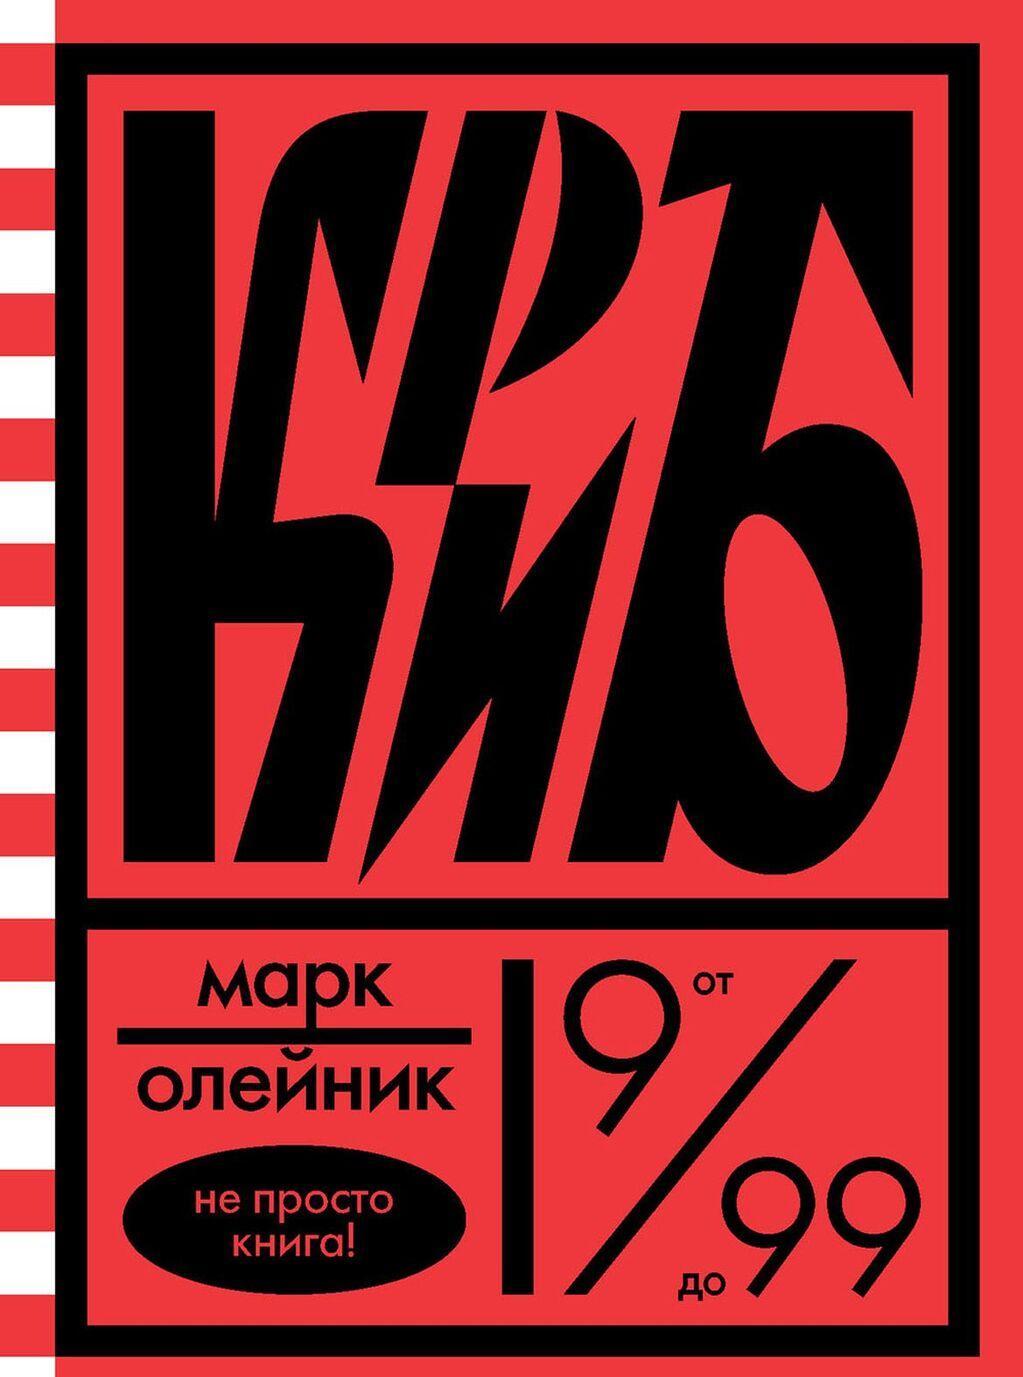 Krib, ili Krasnoe i beloe v zhizni tajnogo pionera Viti Molotkova | Olejnik Mark